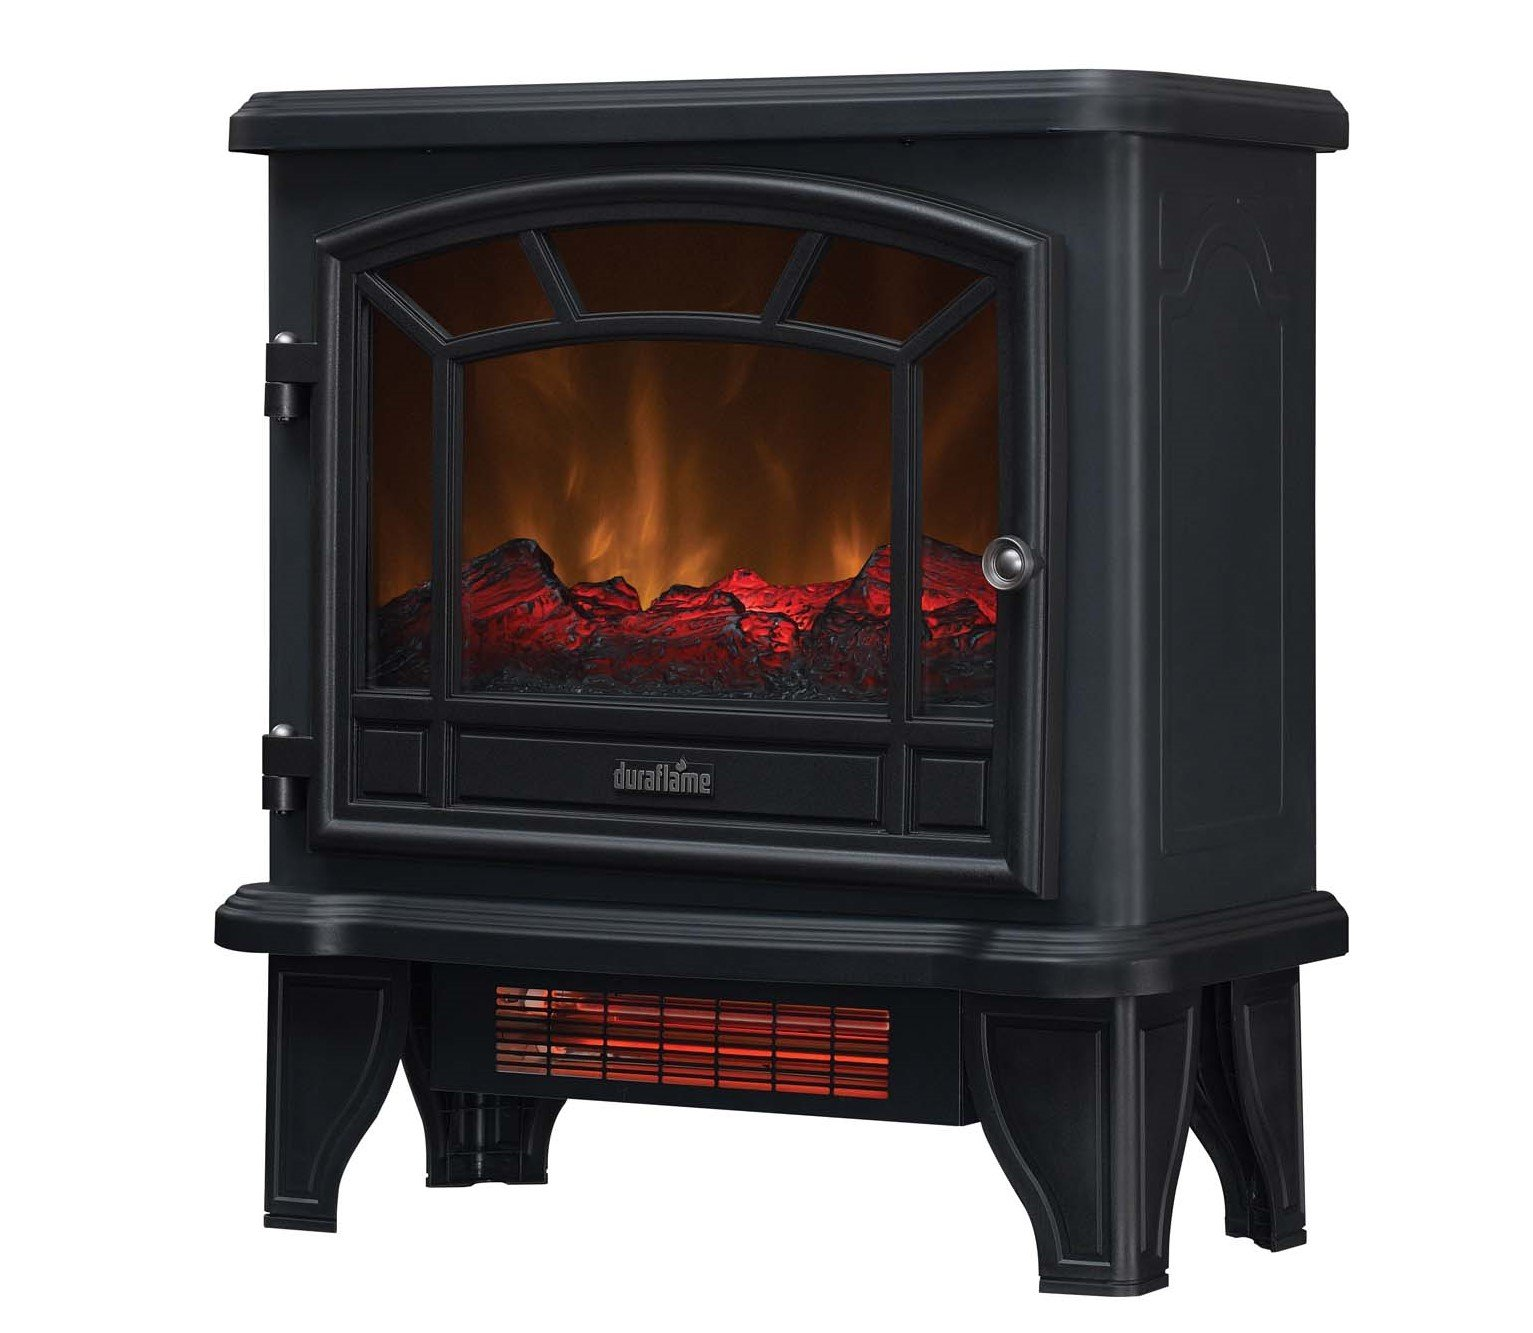 Duraflame Infrared Quartz Electric Stove Heater, Black - DFI-550-36